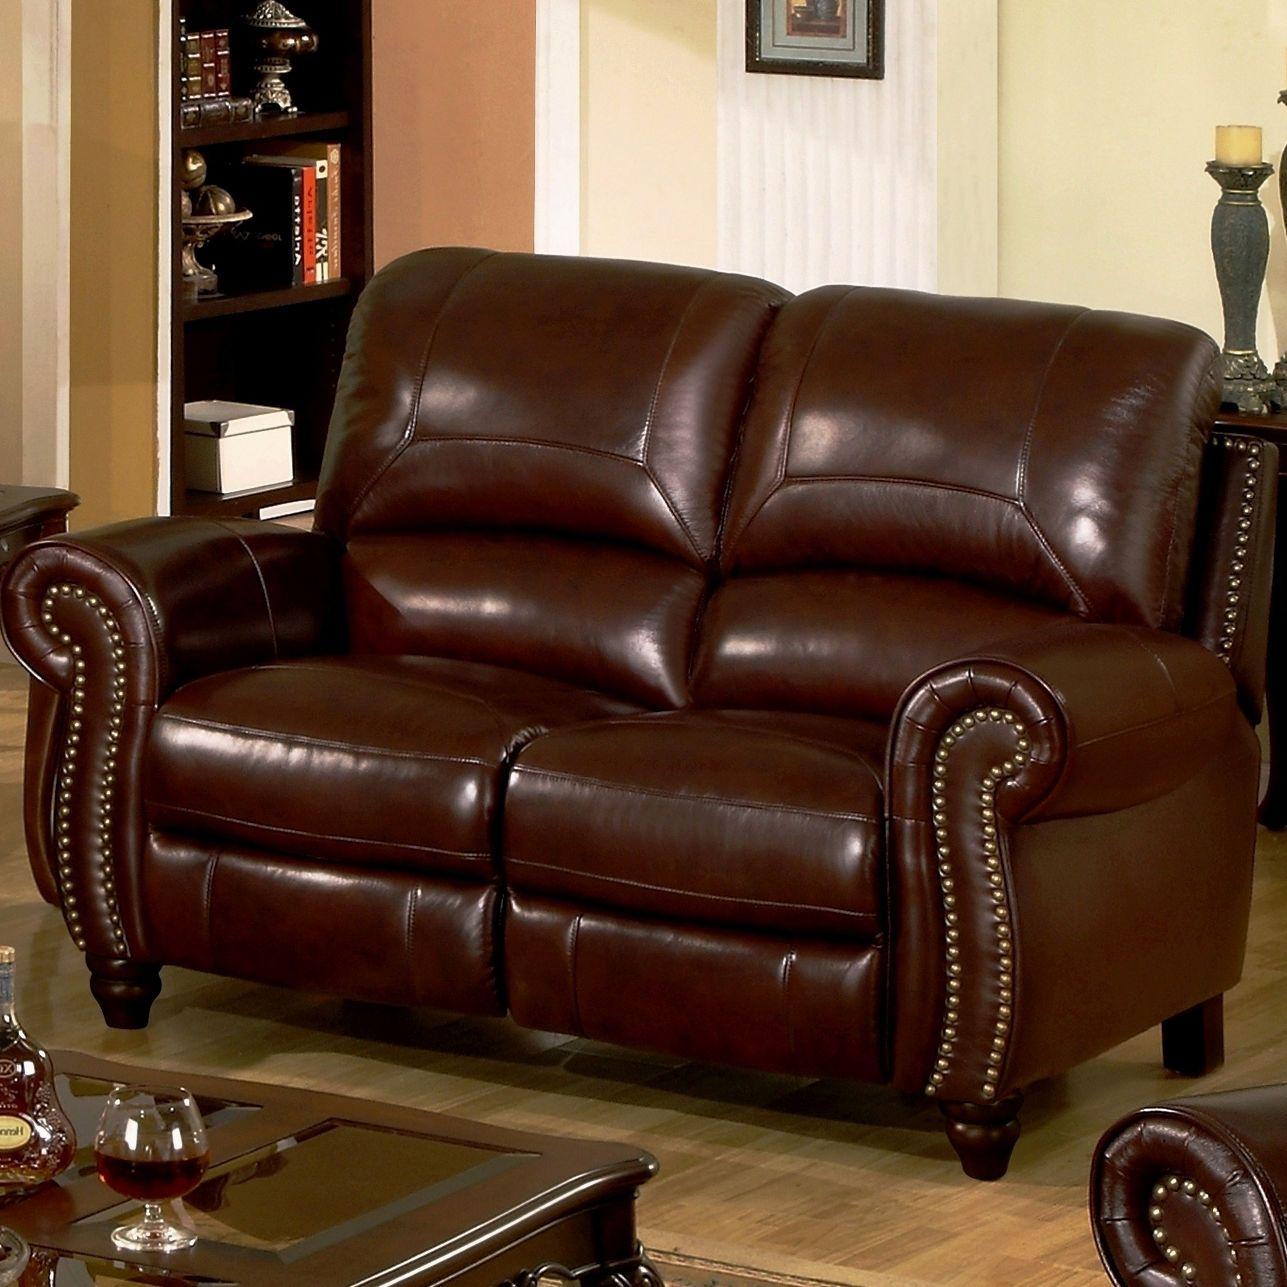 Abbyson Leather Sofa Presley Espresso Reclining Living Charlotte Loveseat